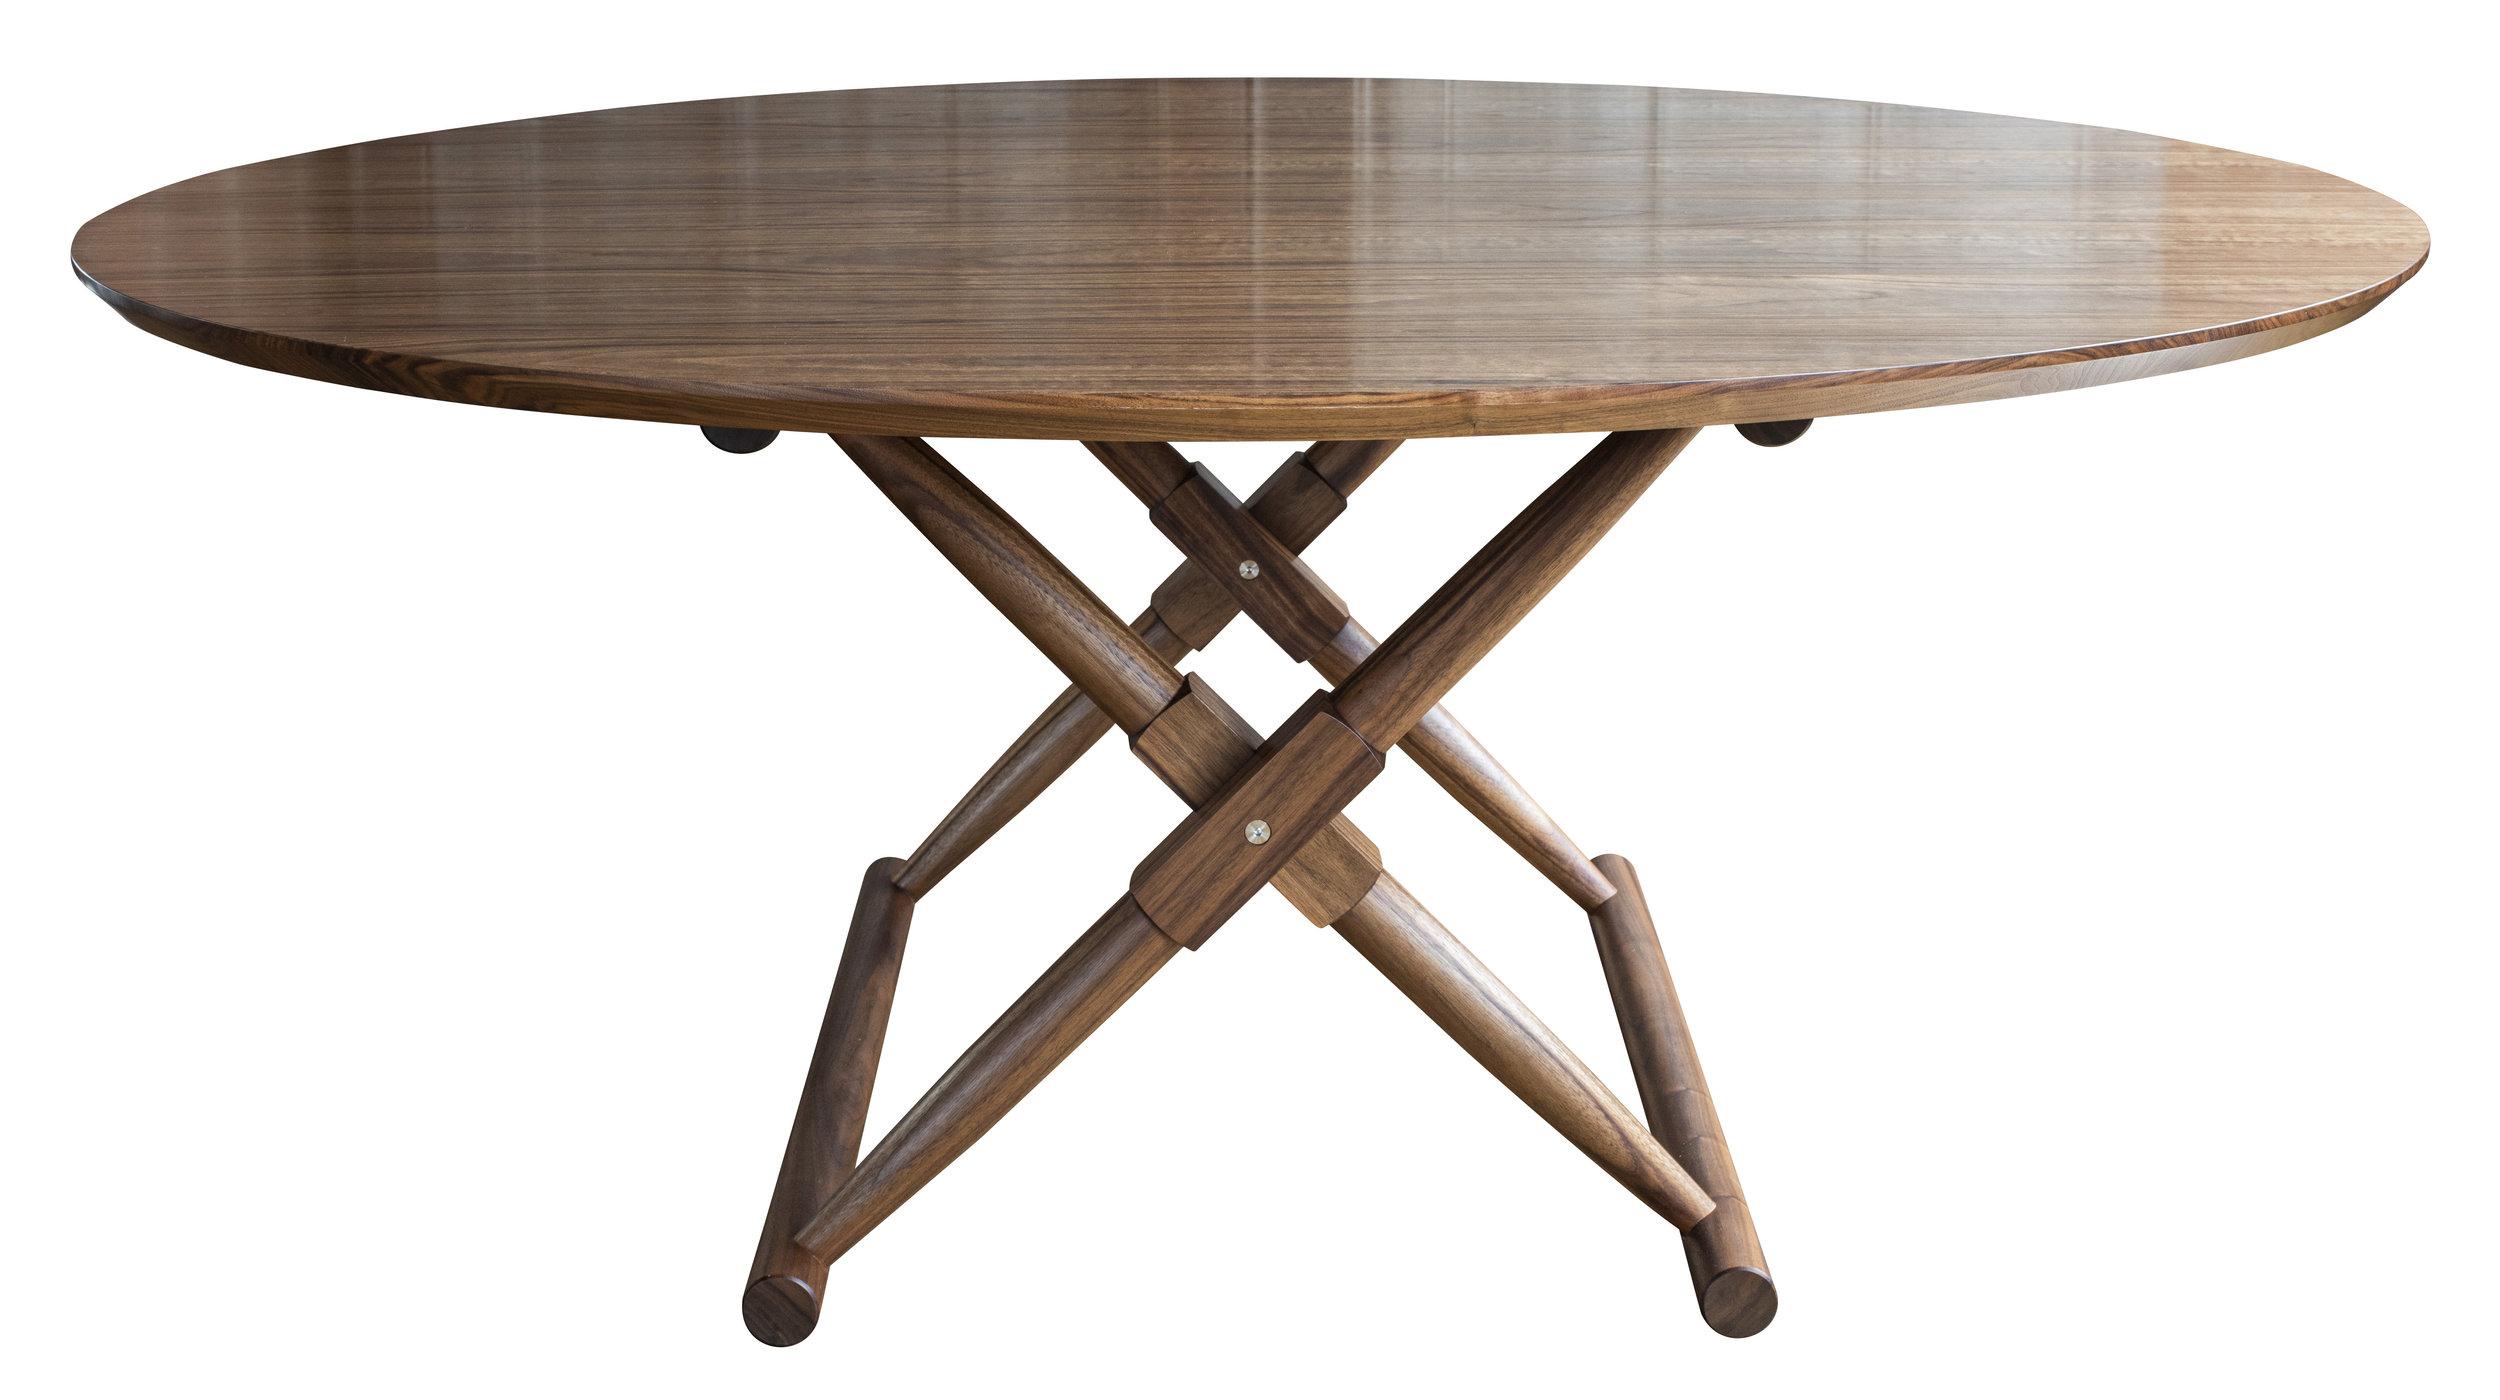 Matthiessen Dining Table